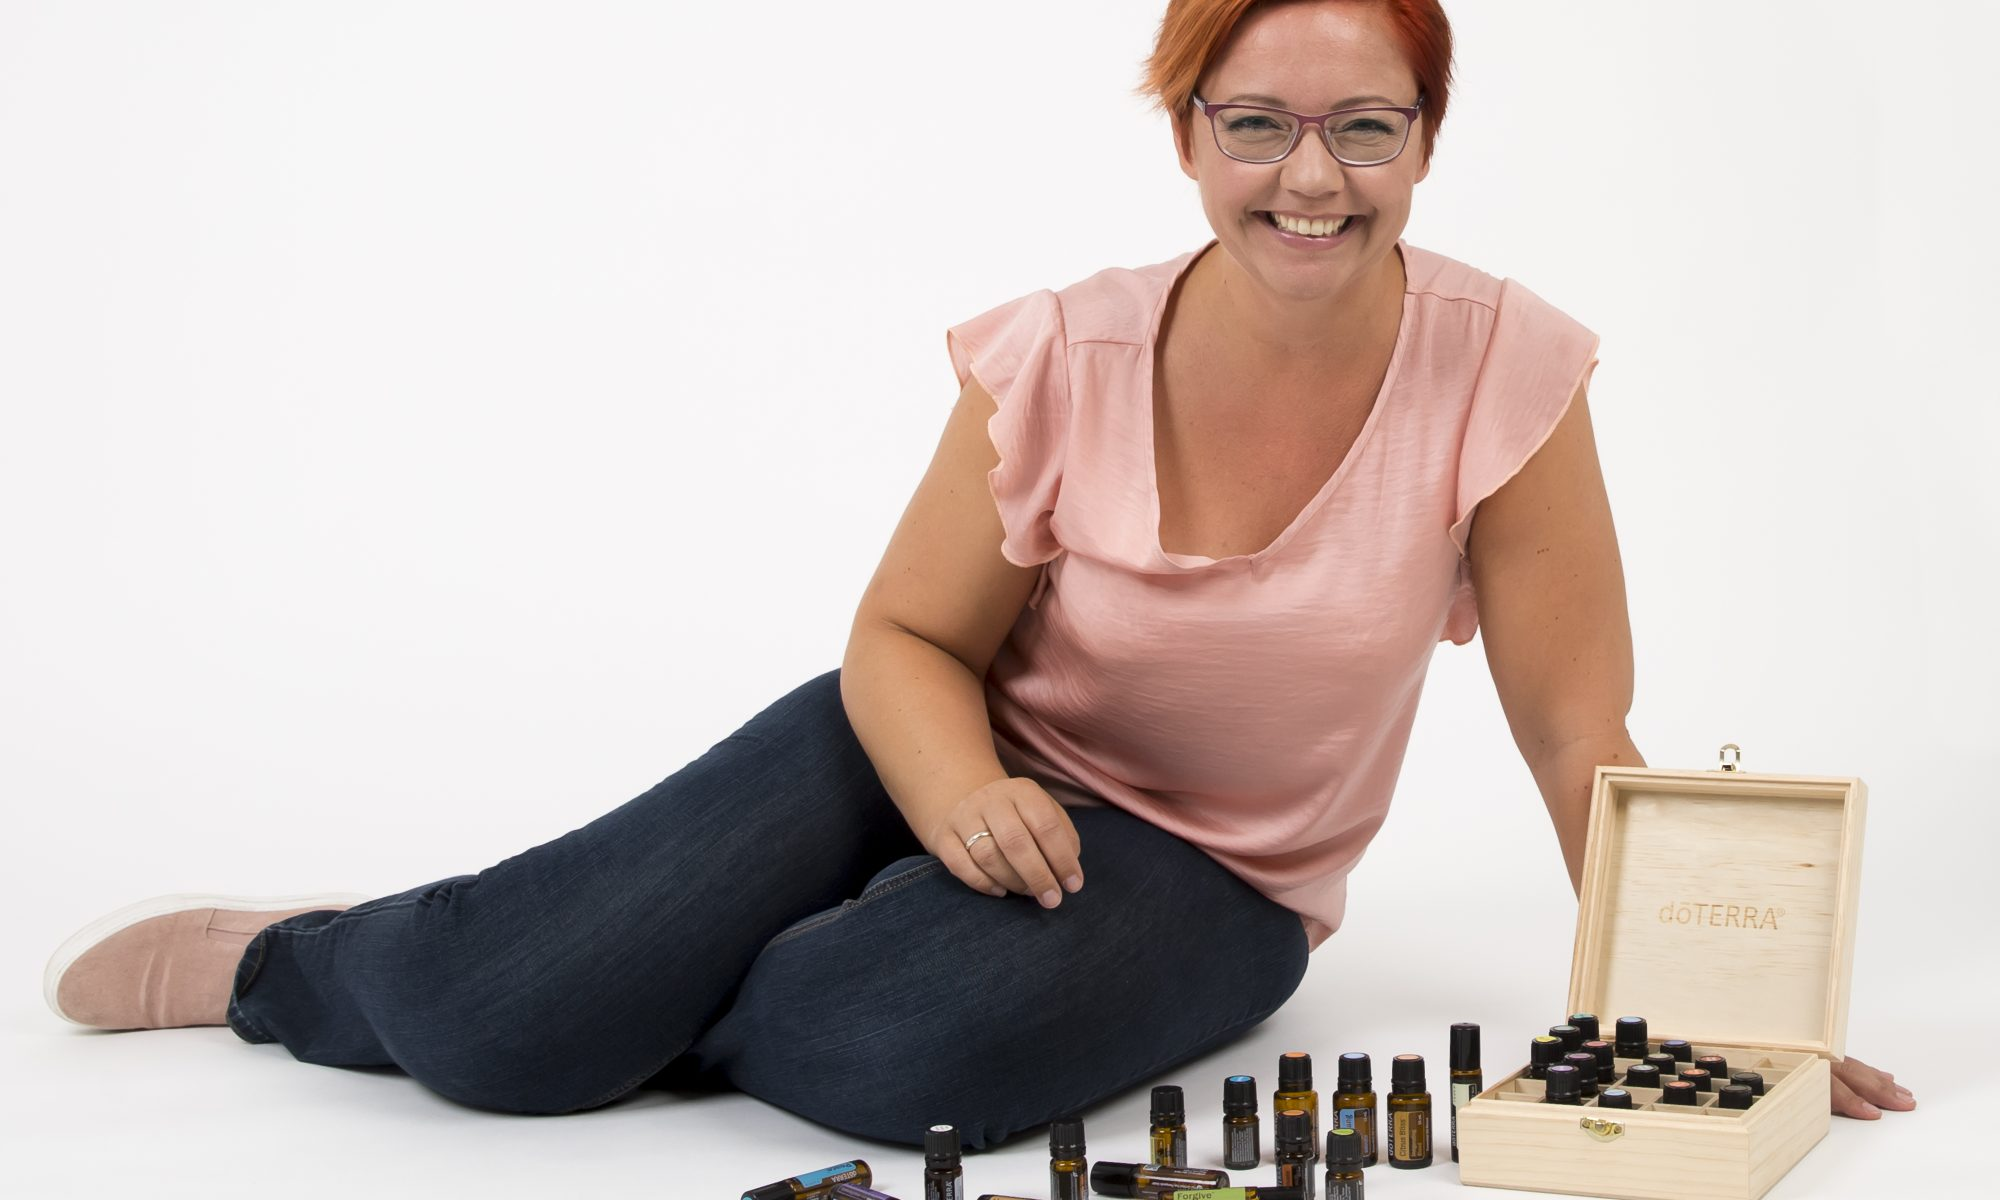 Heidie Kosiara din ekspert inden for aromaterapi